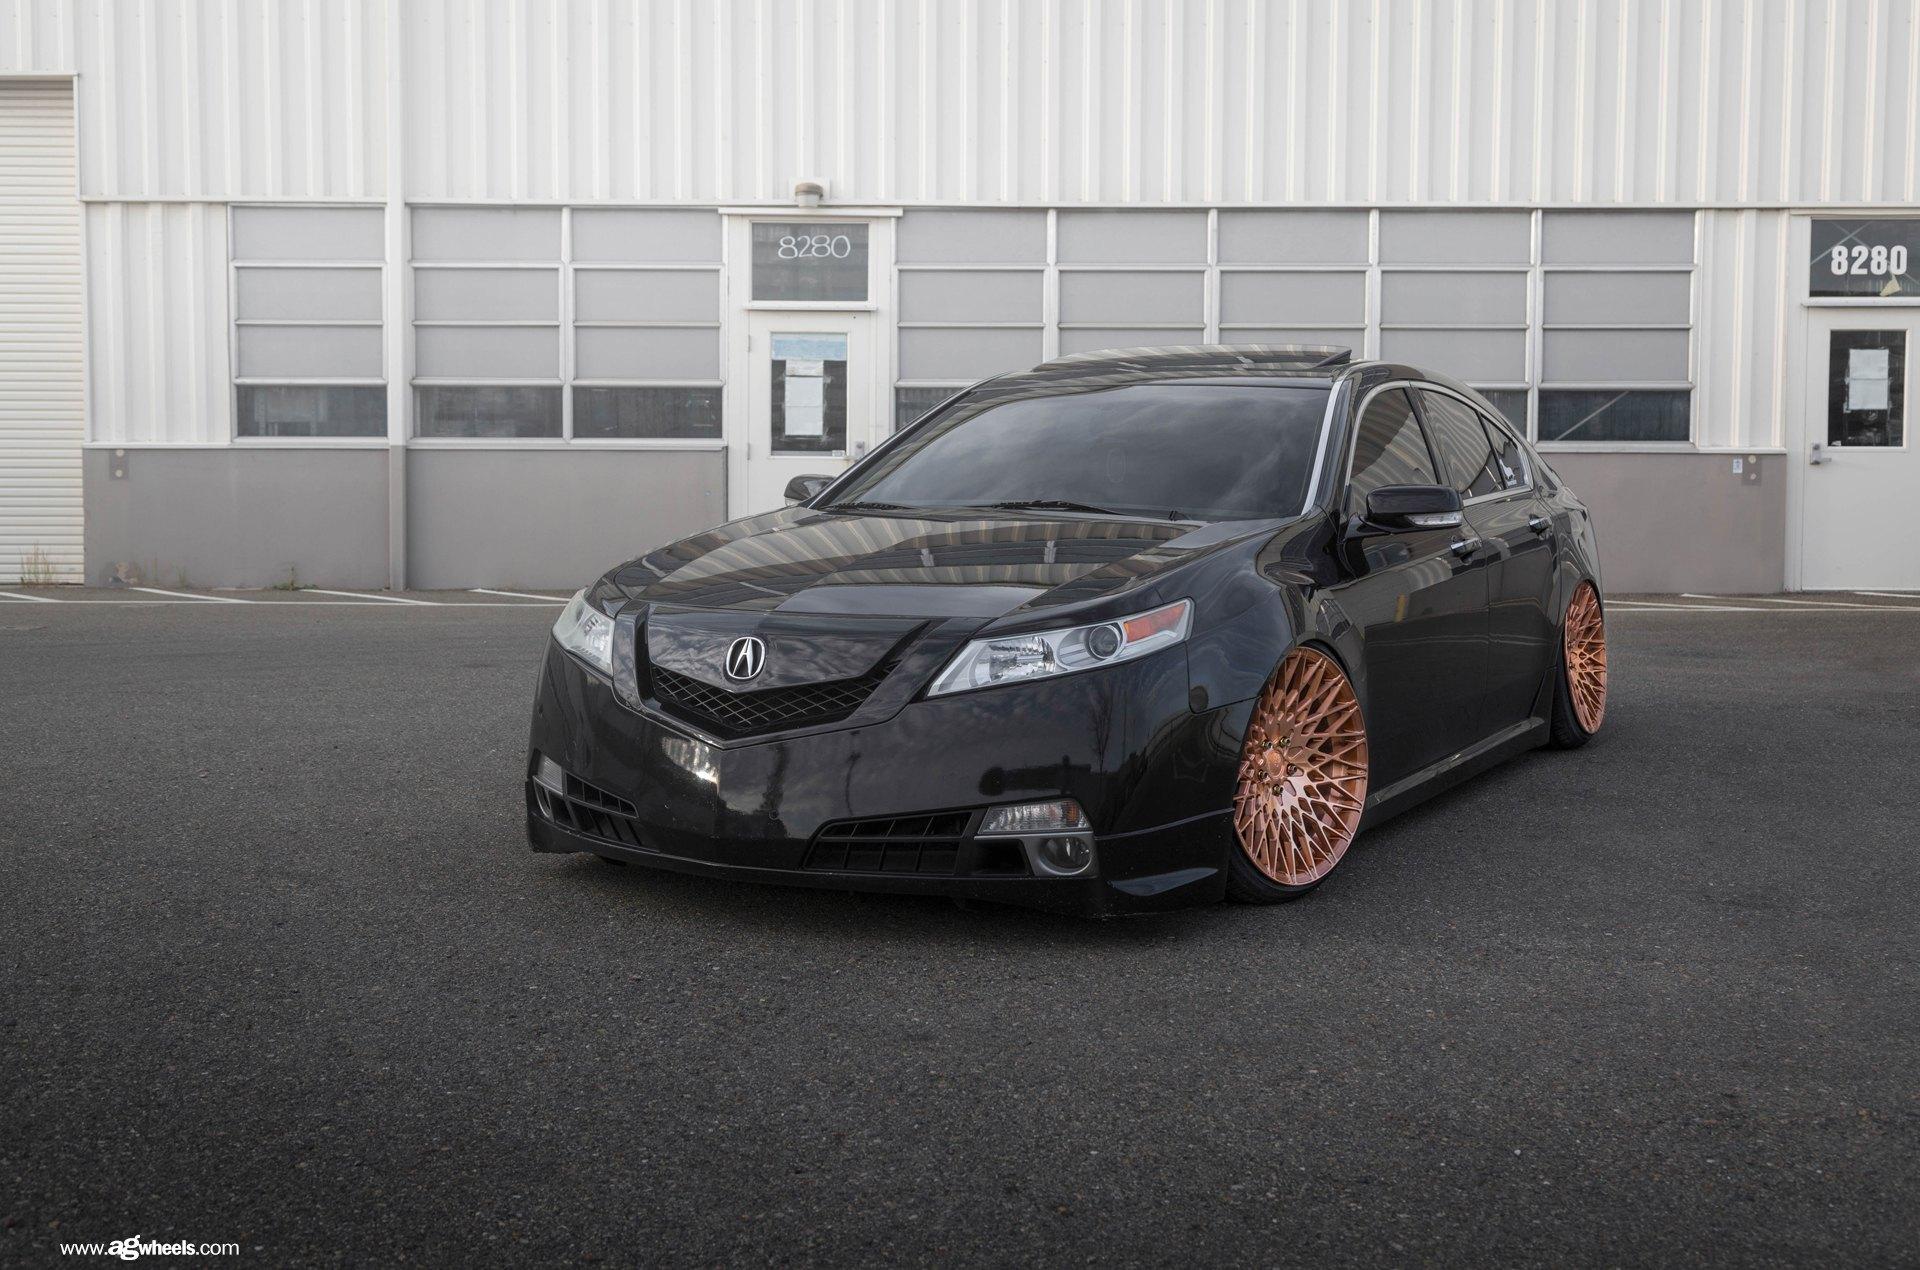 Slammed Acura TL On Copper Rims By Avant Garde CARiDcom Gallery - Acura tl rim